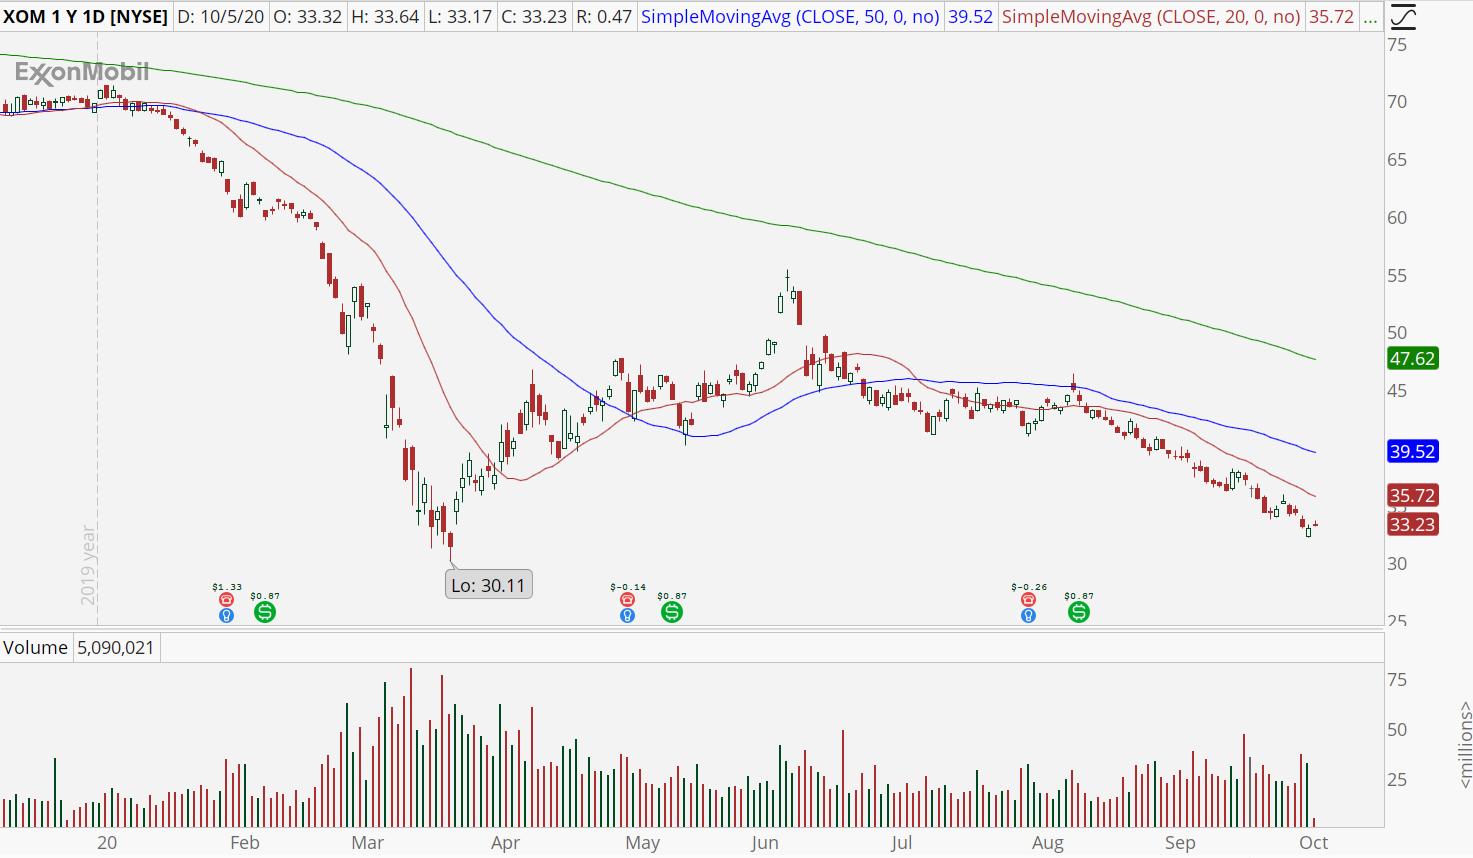 Exxon Mobil (XOM) chart showing bear retracement